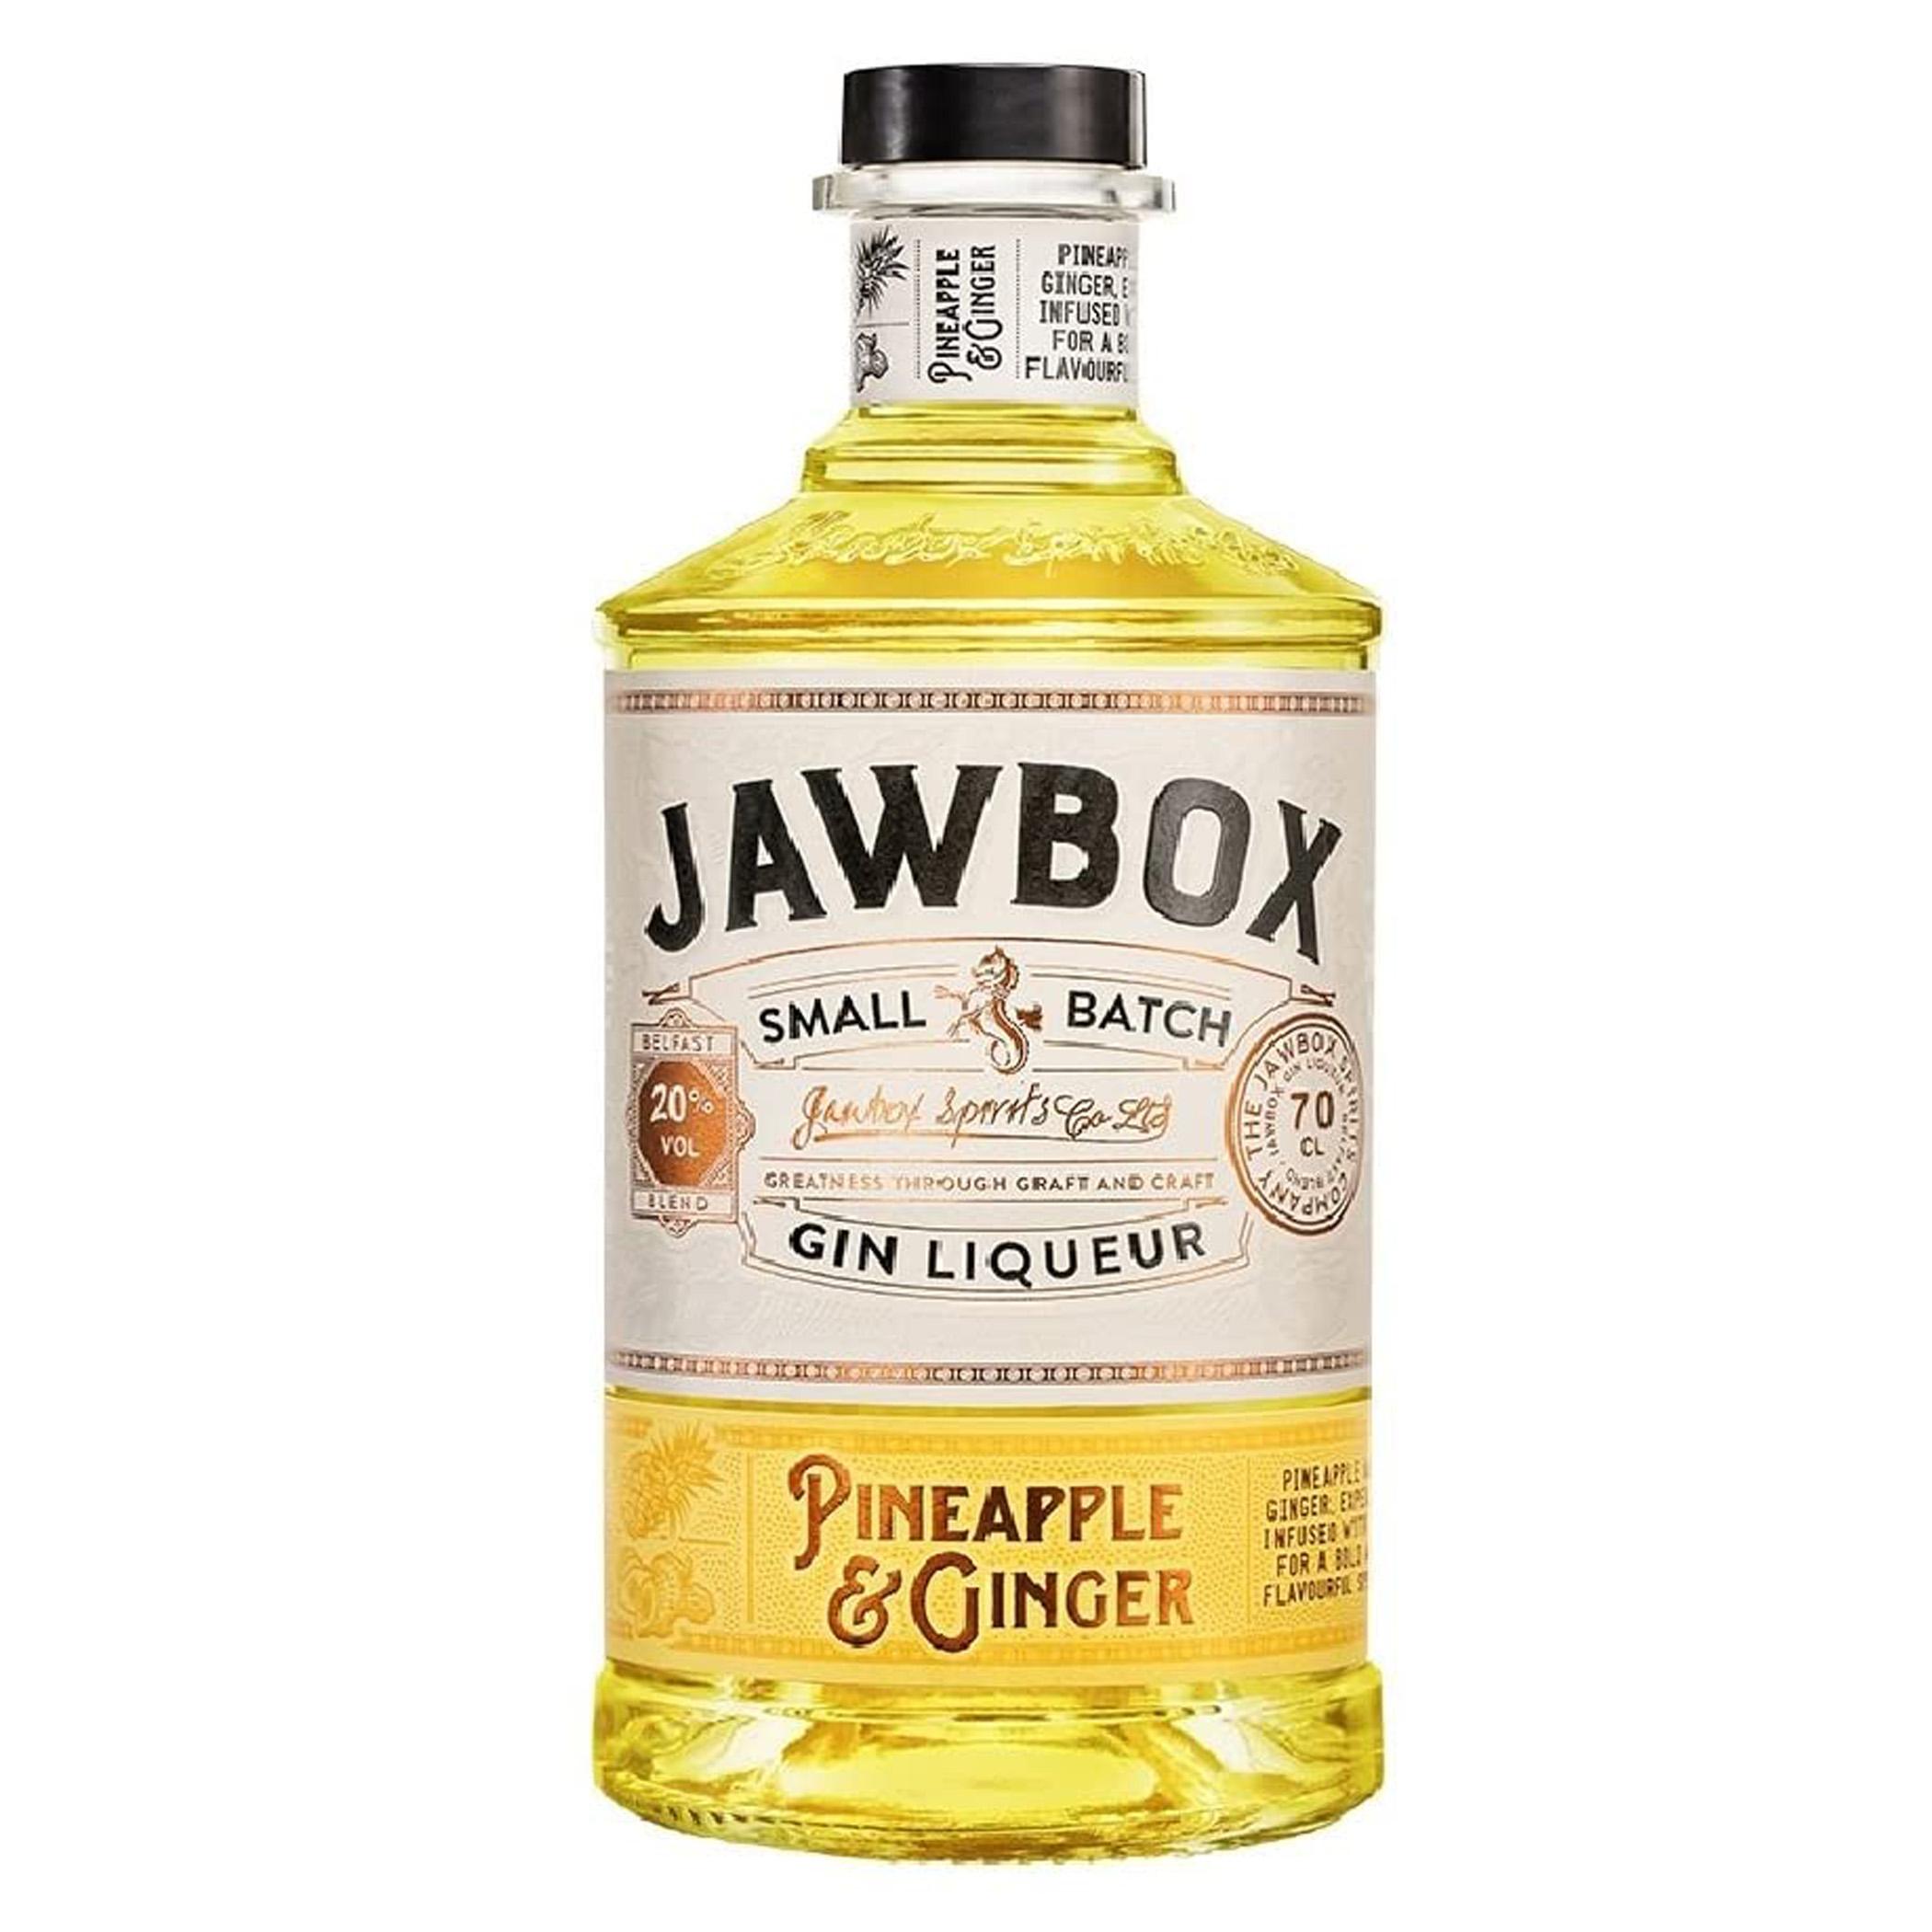 Jawbox Pineapple & Ginger Gin